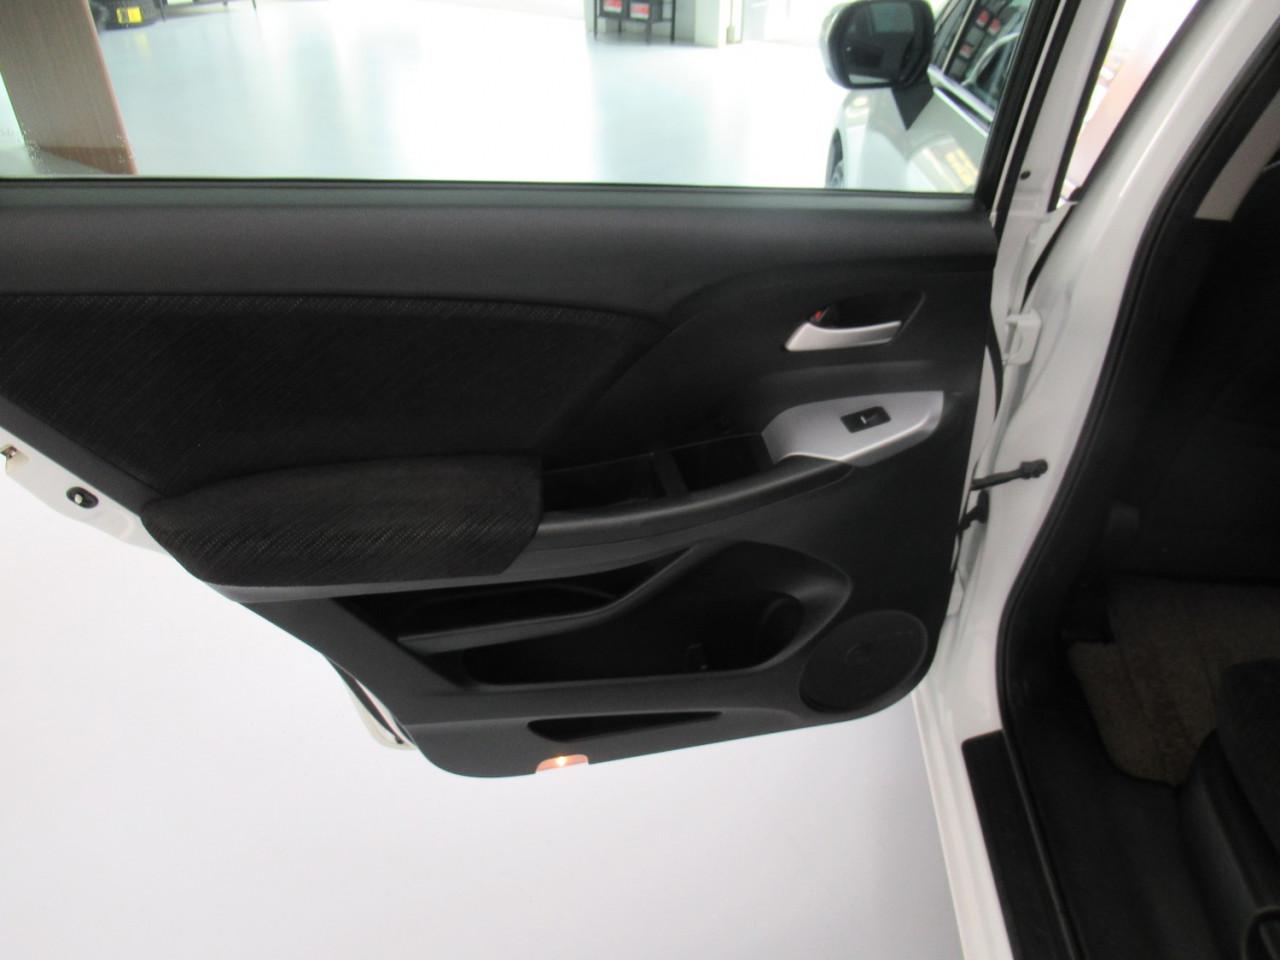 2013 Honda Odyssey 4TH GEN MY13 Wagon Image 29